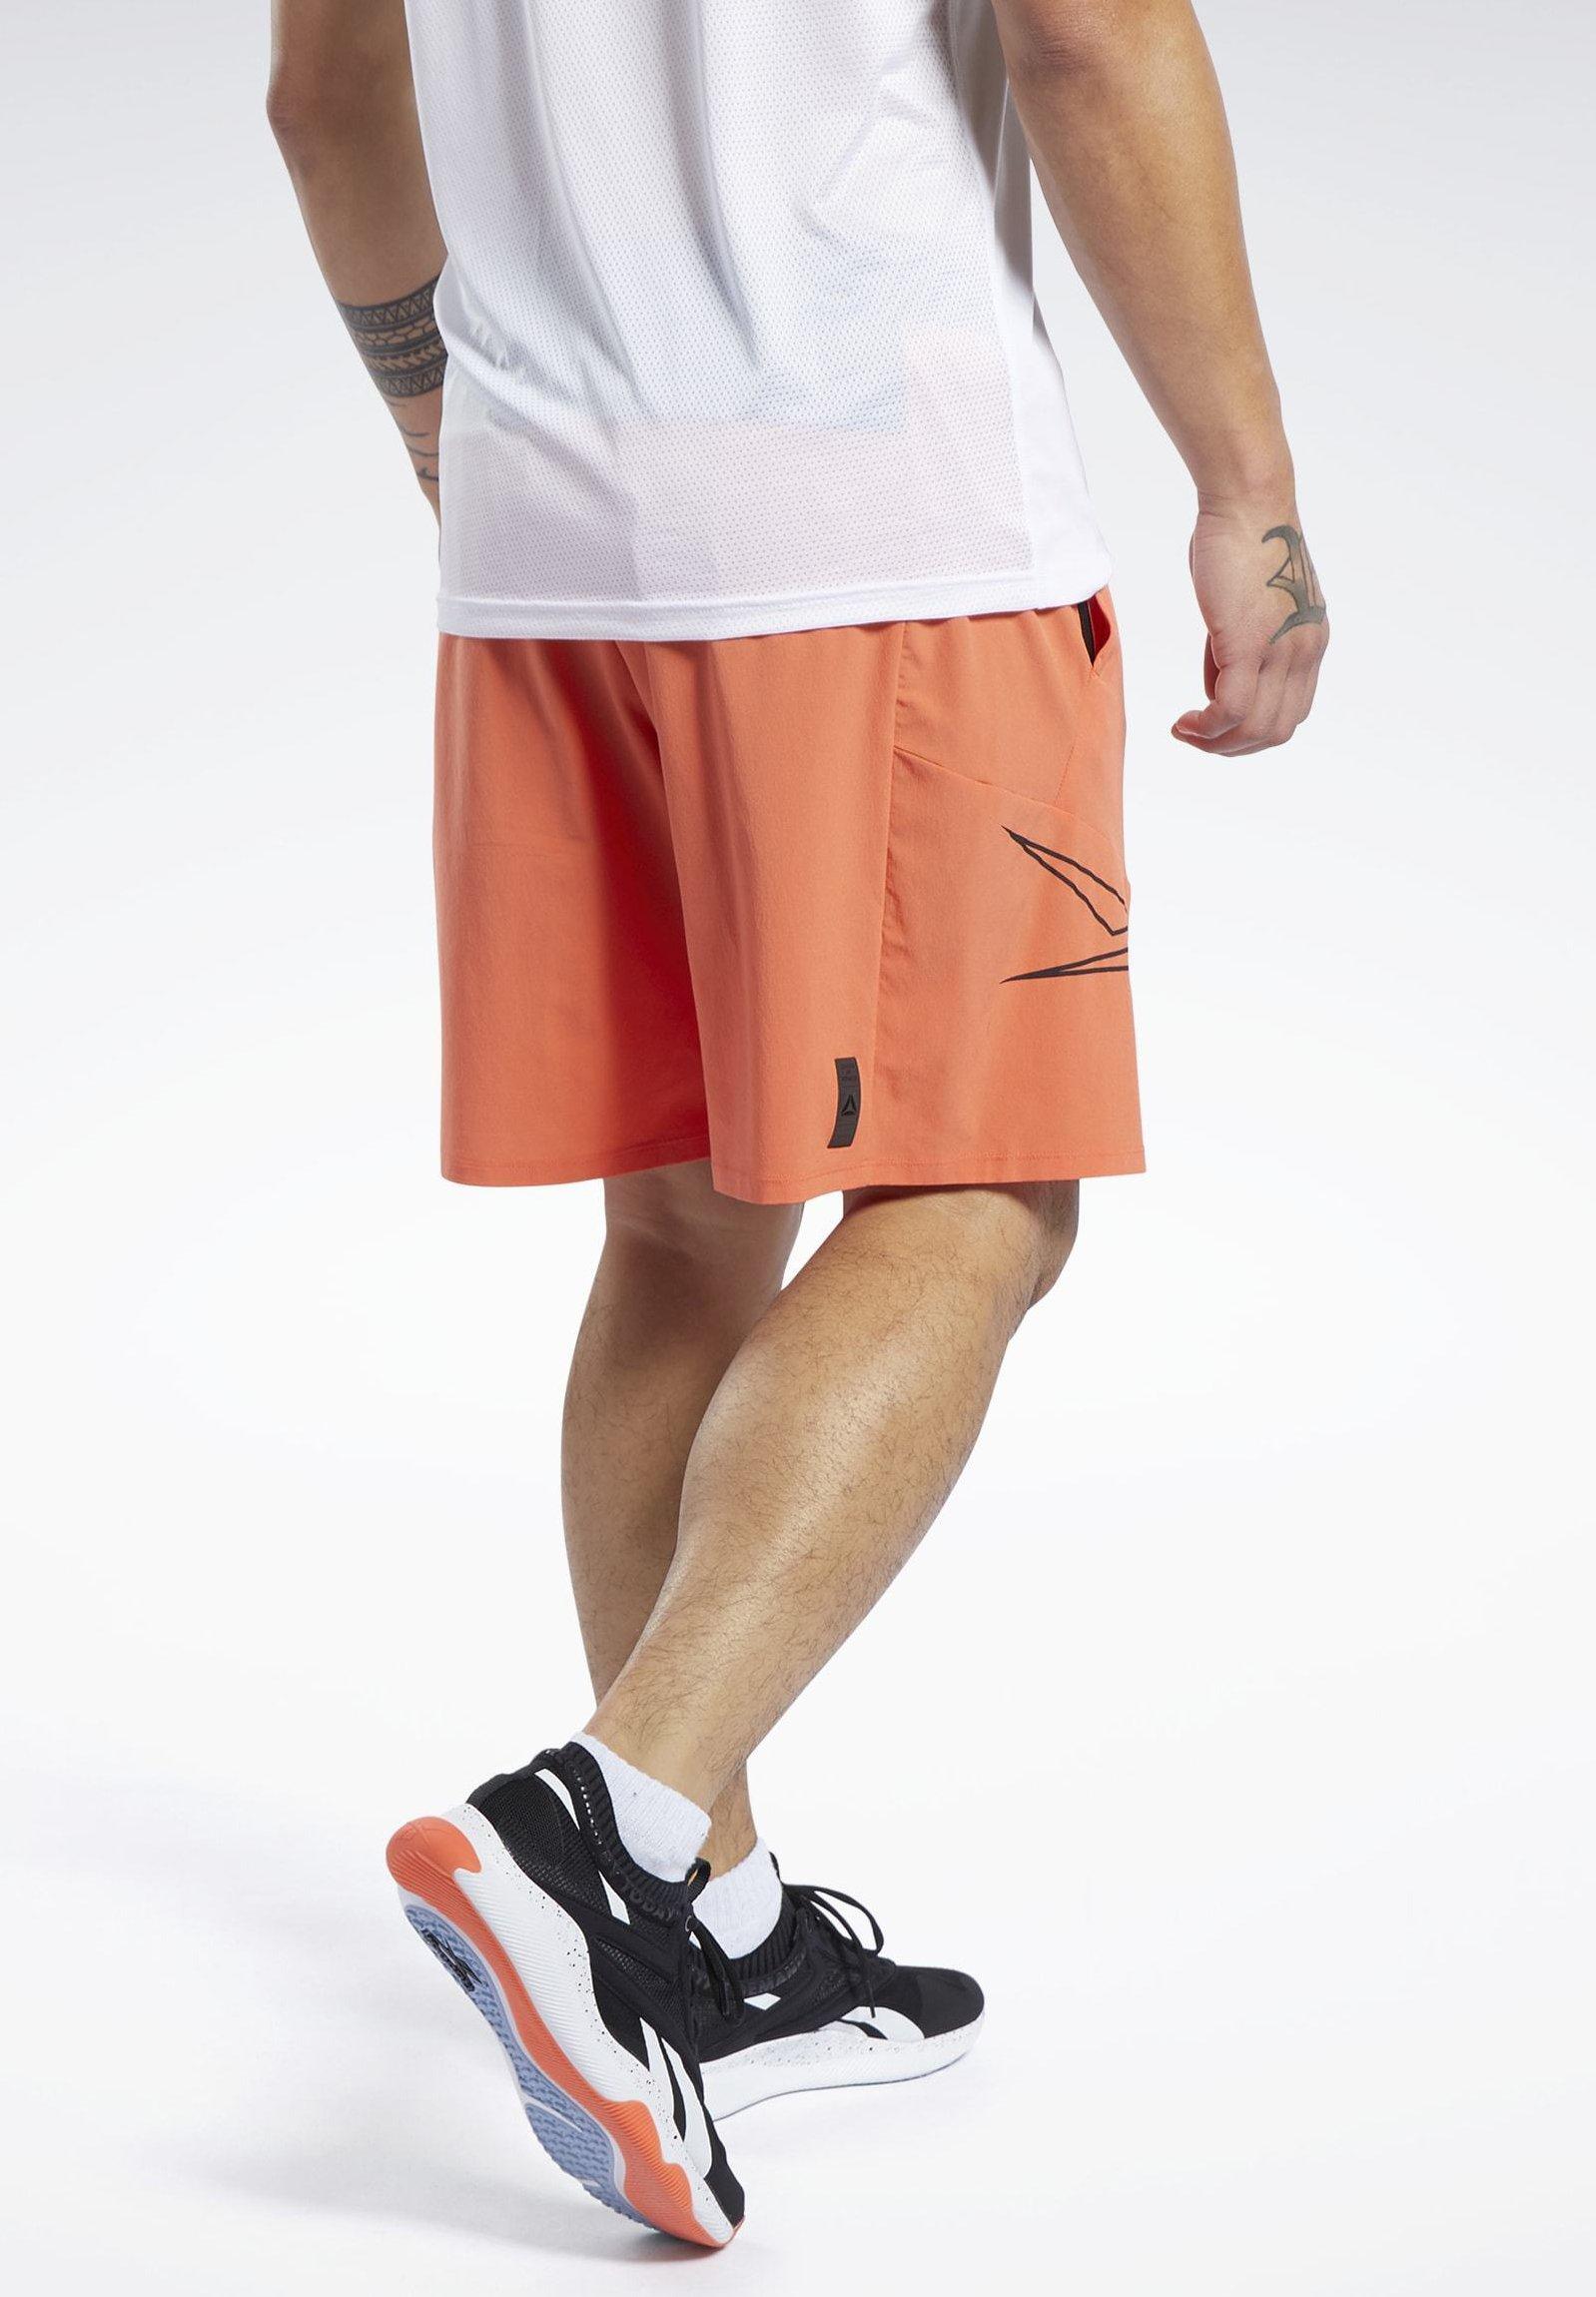 Reebok UNITED BY FITNESS EPIC SHORTS - Krótkie spodenki sportowe - vivid orange